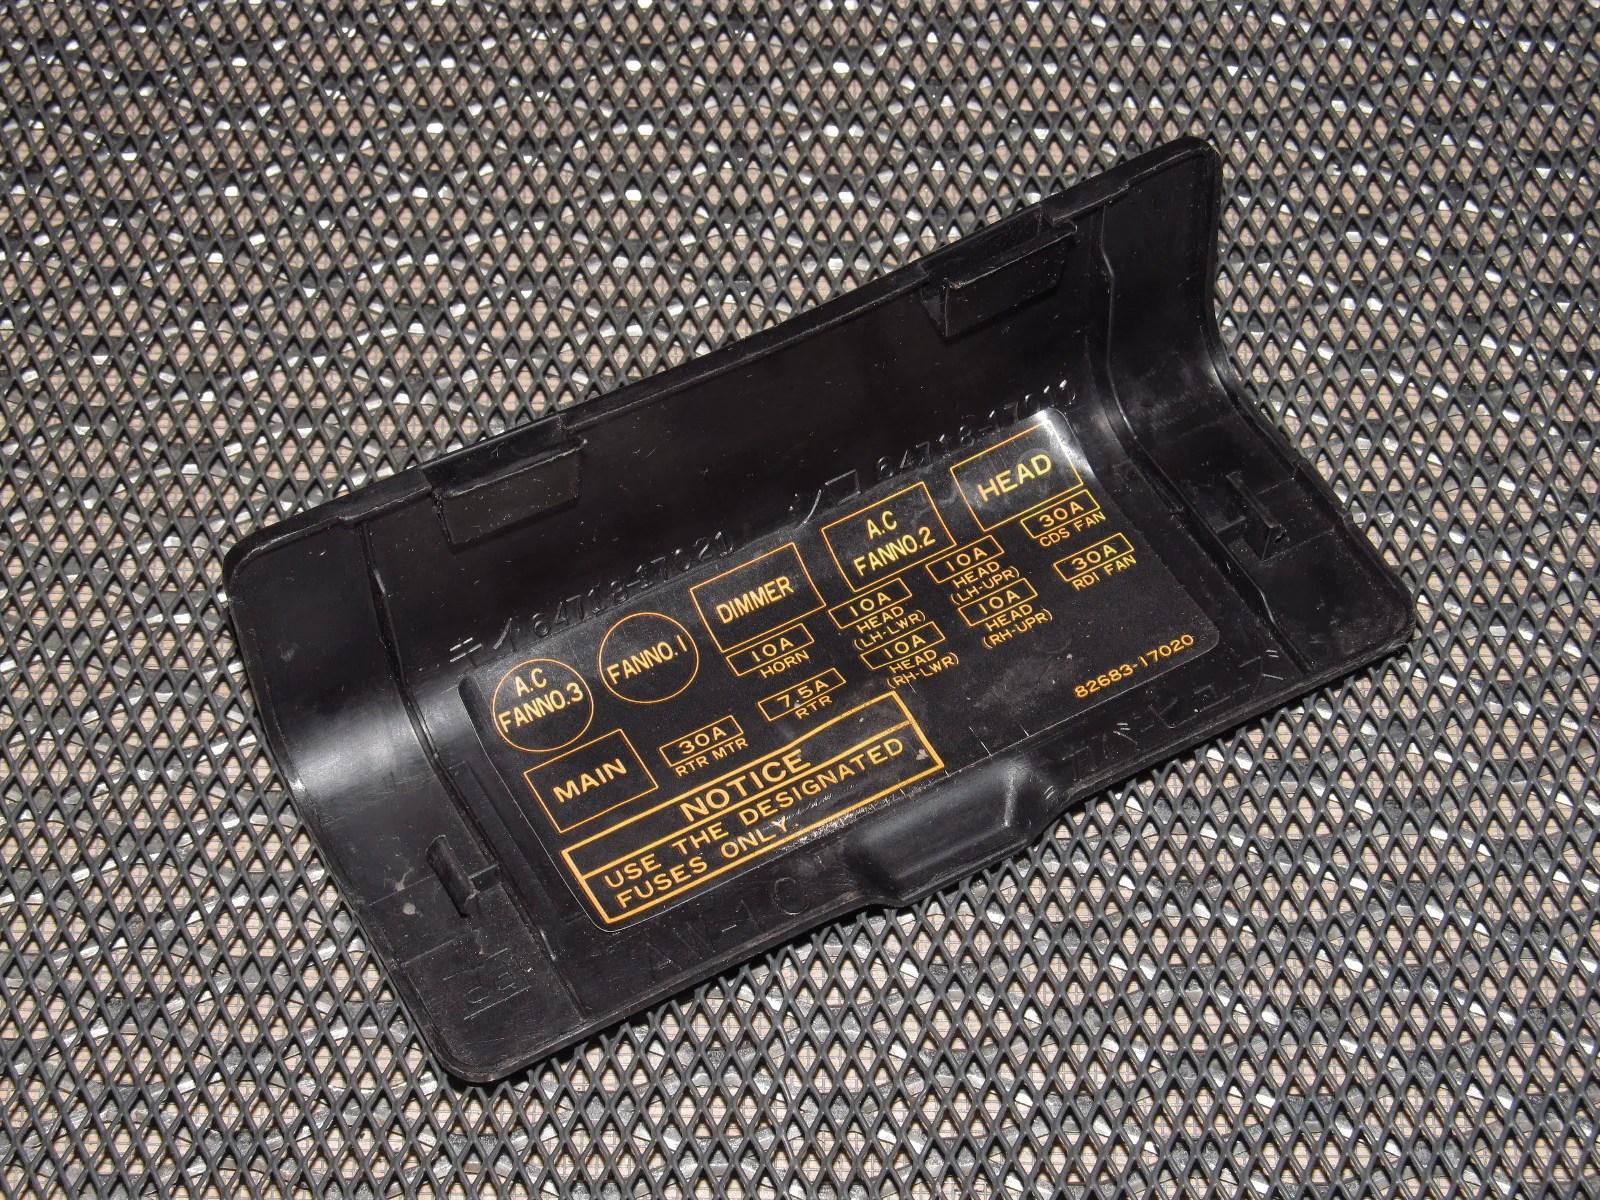 1991 toyotum mr2 fuse box wiring uk [ 1600 x 1200 Pixel ]